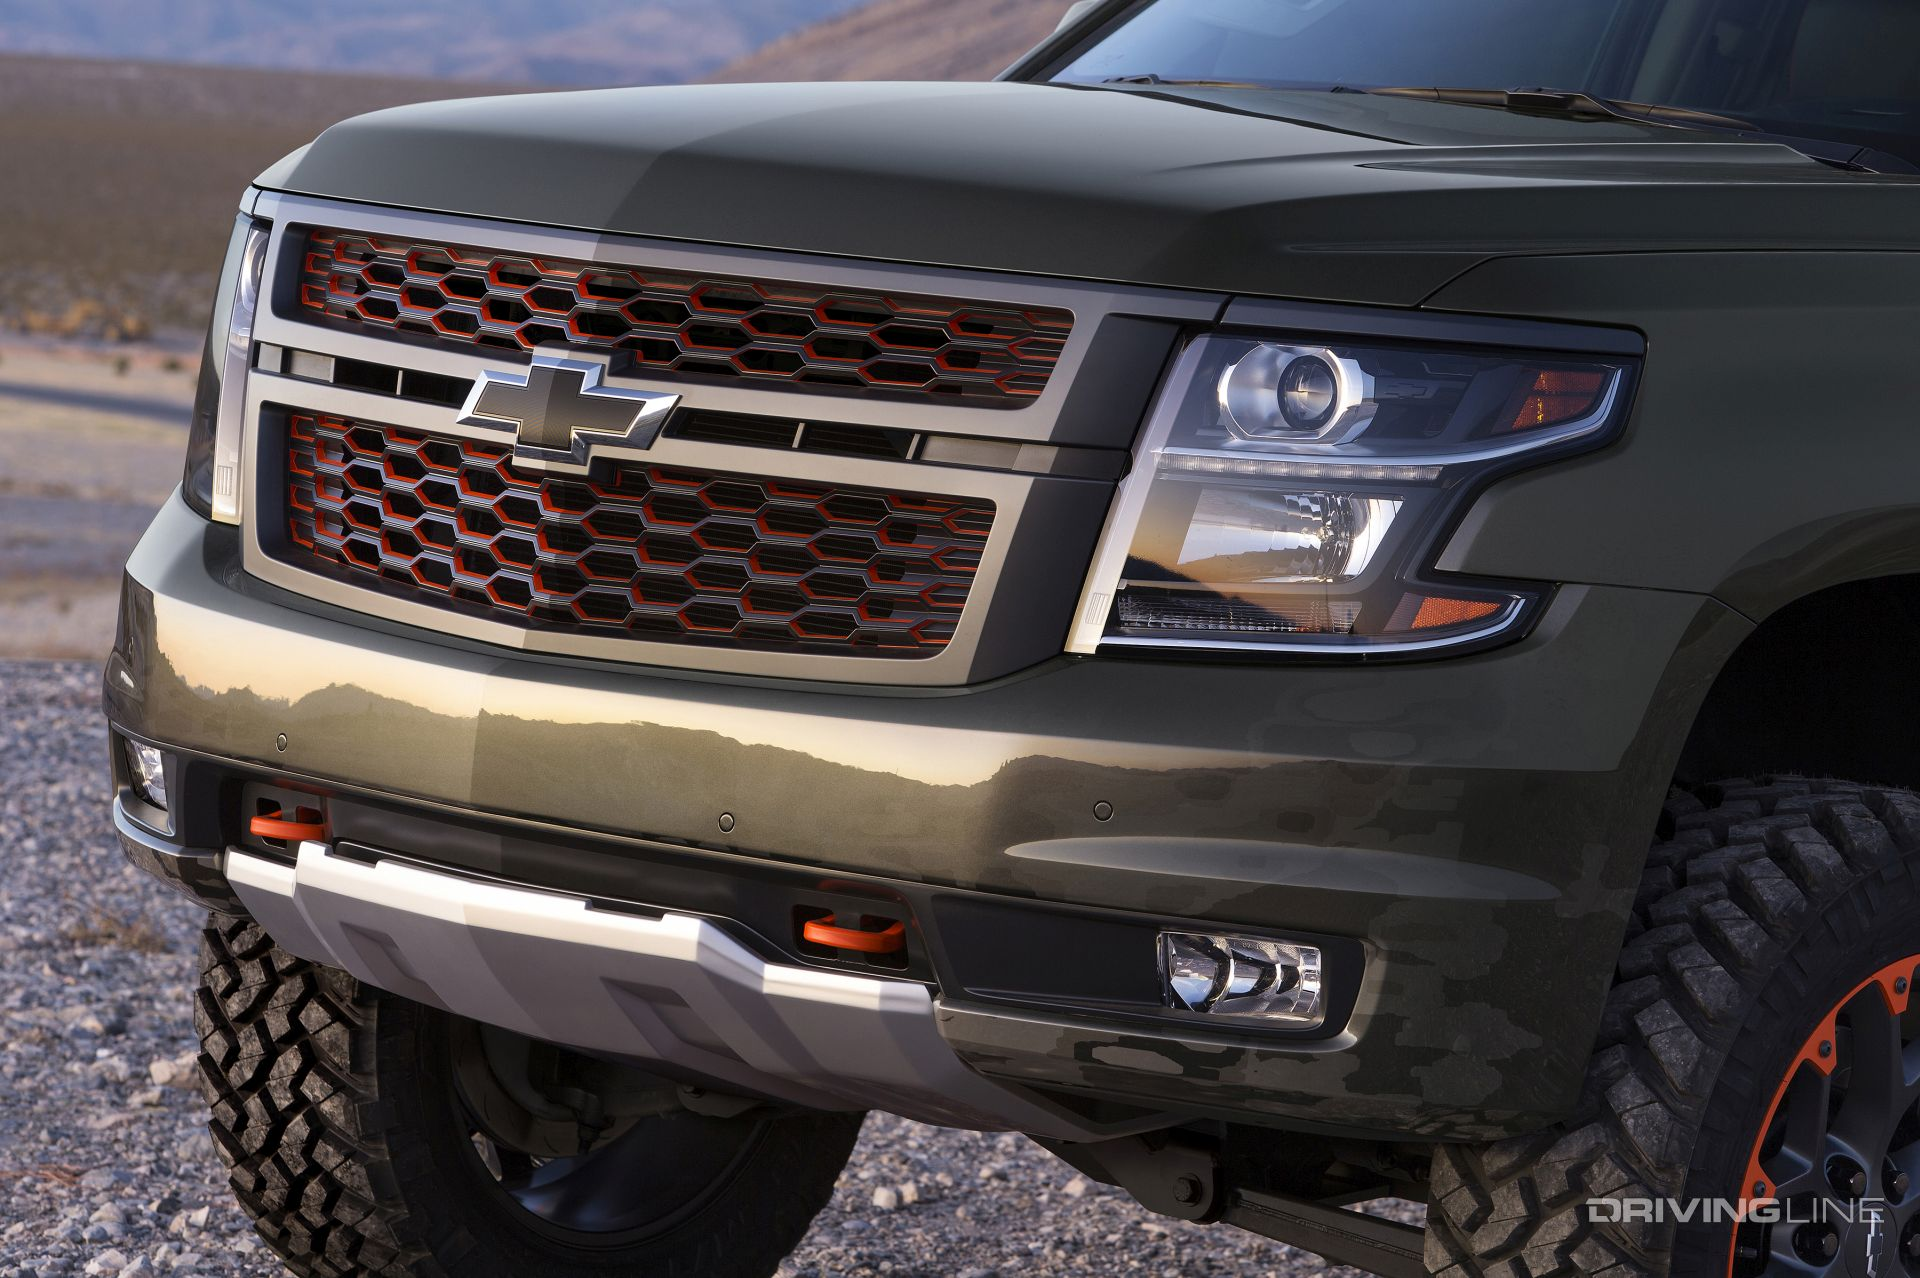 Luke Bryan's 2018 Chevy Suburban Concept | DrivingLine